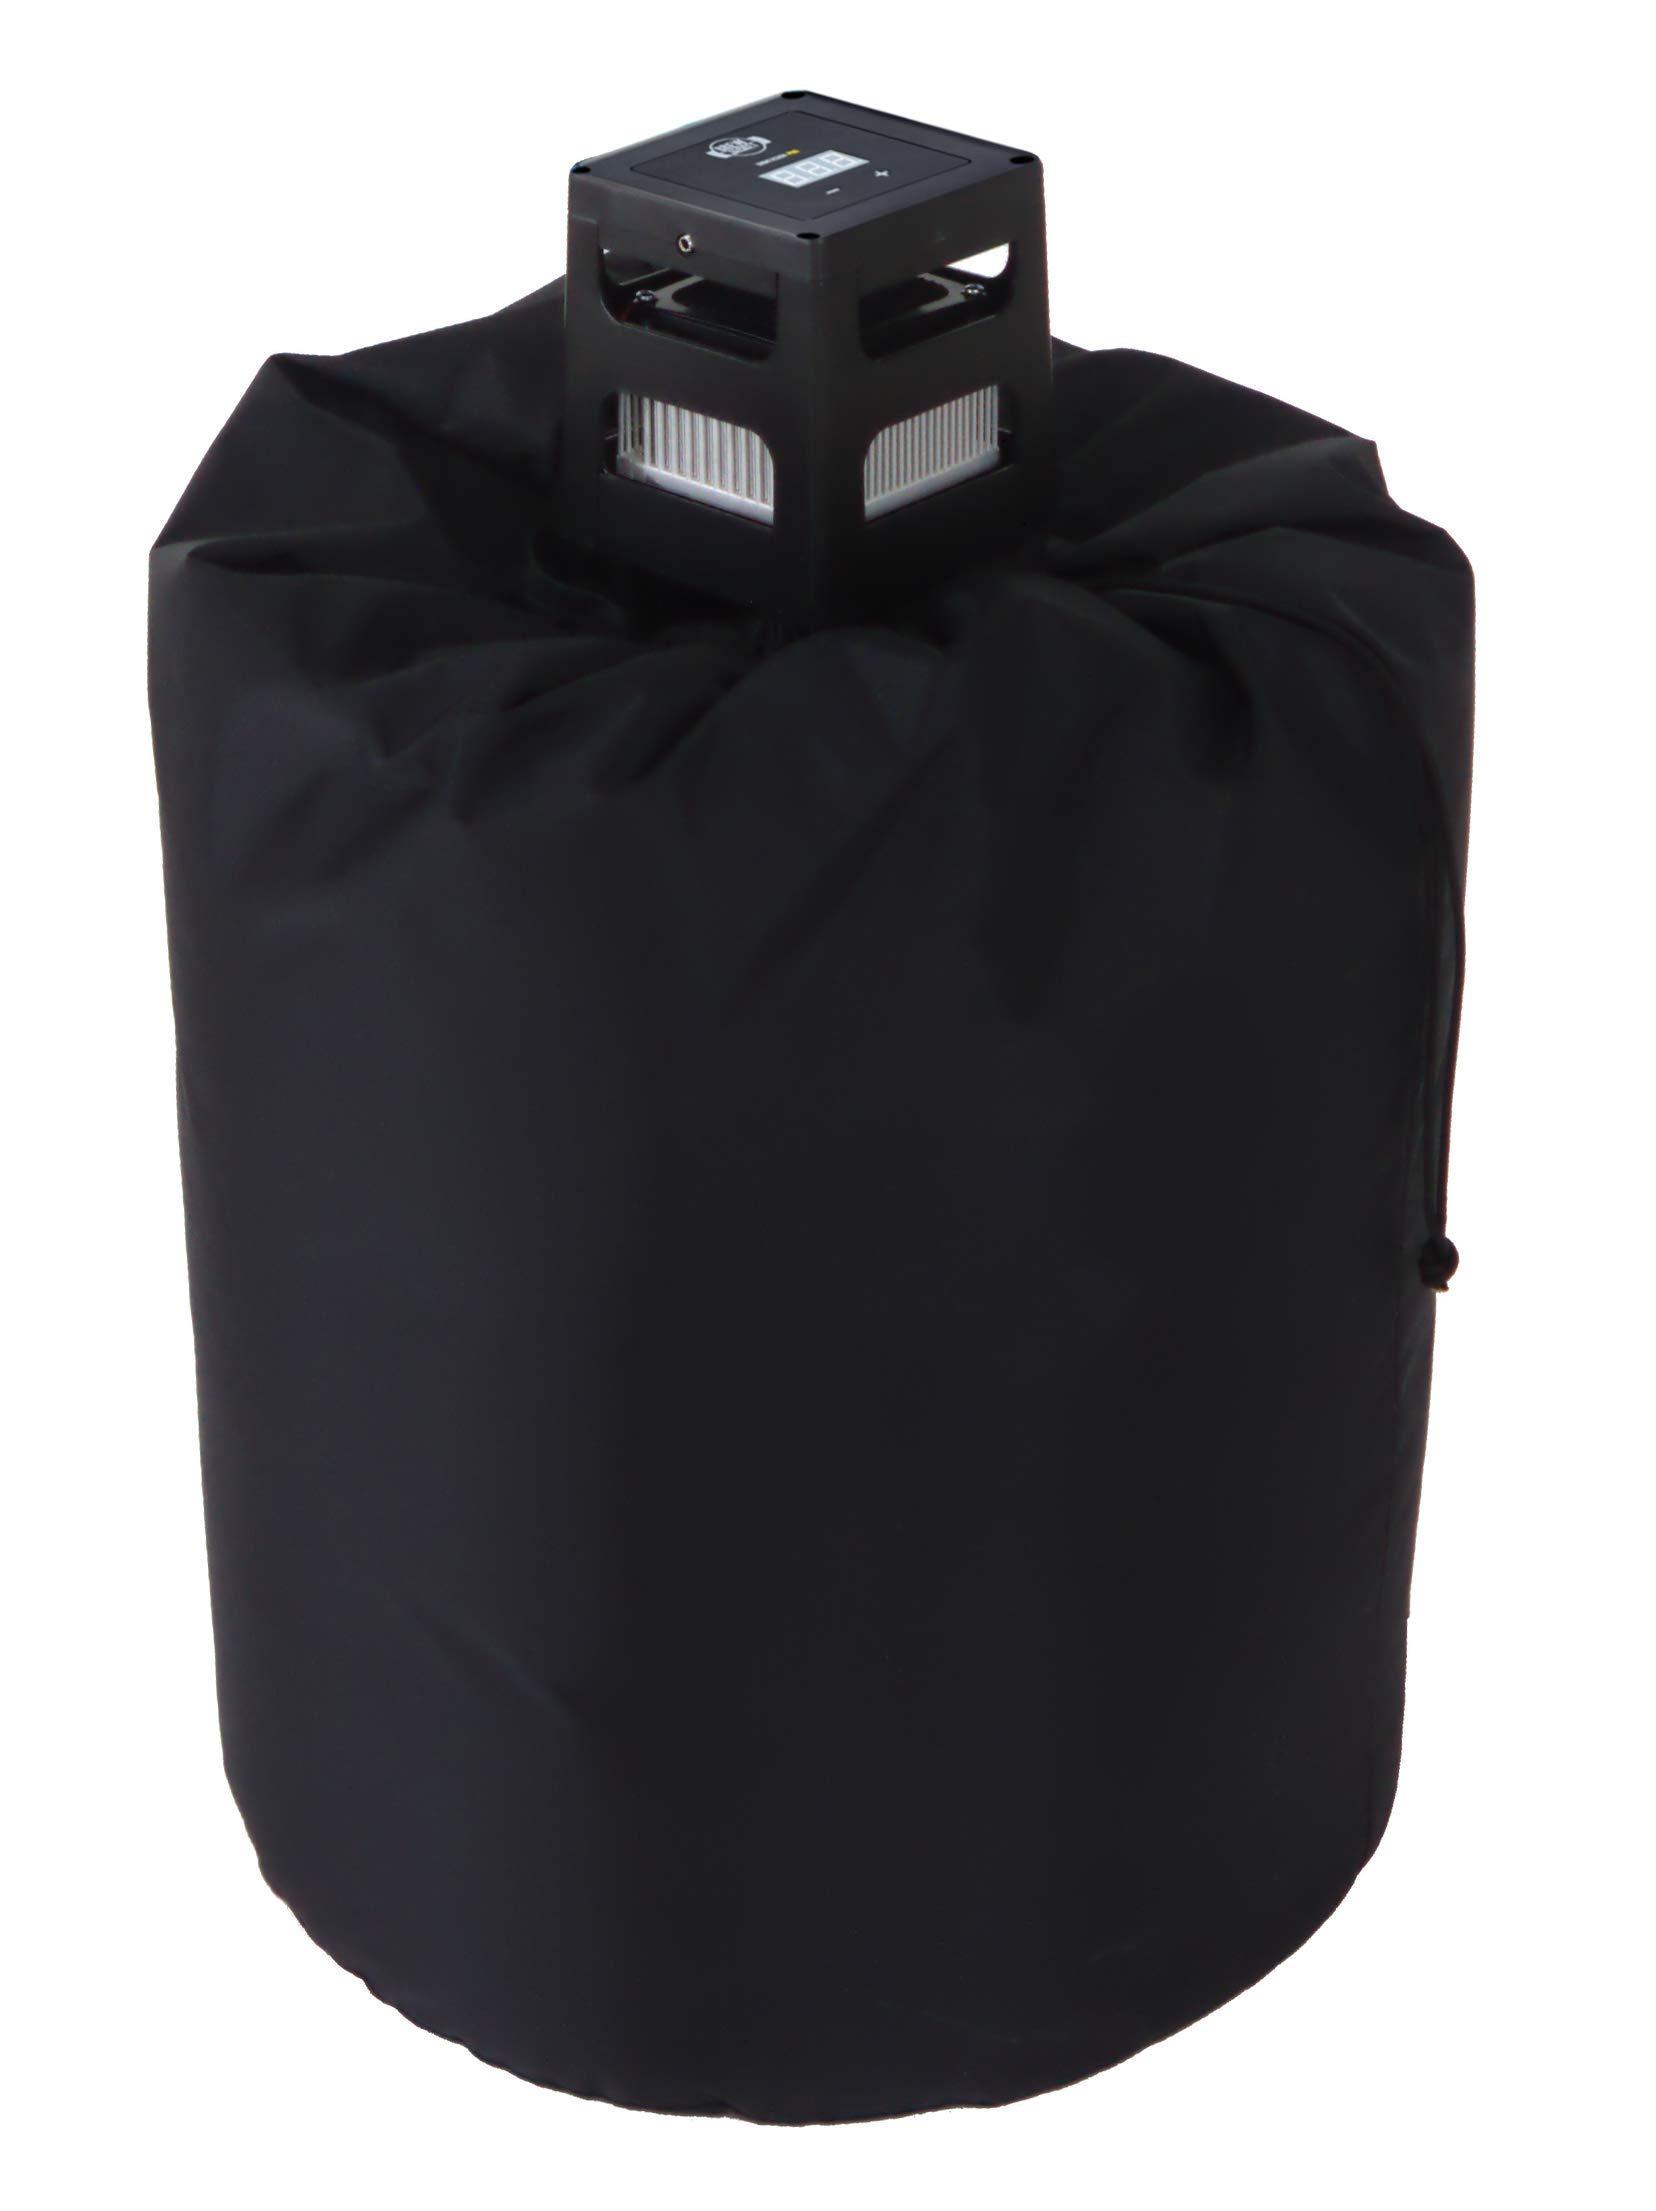 BrewJacket Immersion Pro Fermentation Control System (Carboy/Bucket Jacket) by BrewJacket (Image #4)